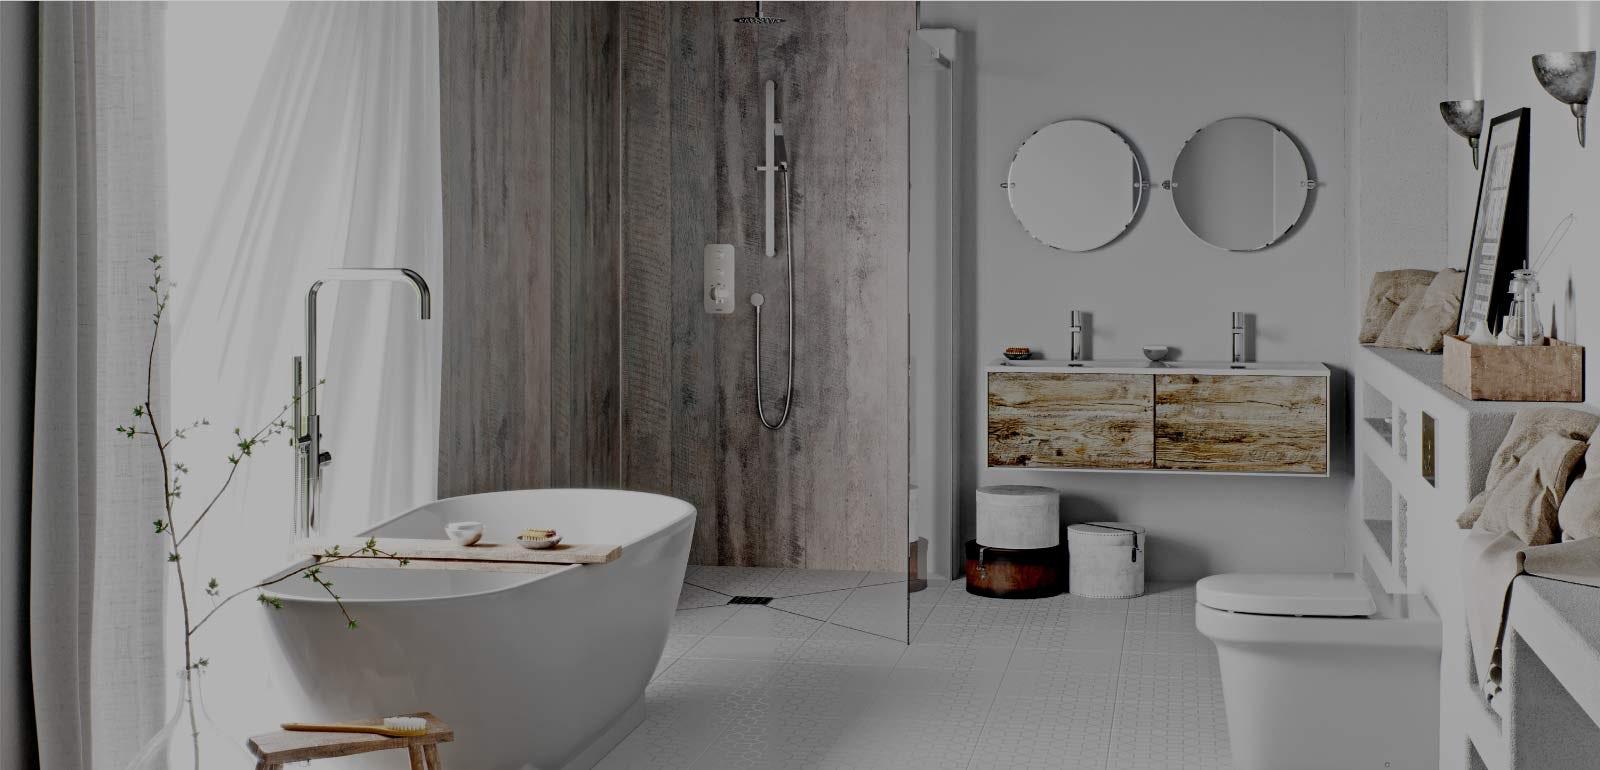 5 bathing beauties: Bath ideas for 2019